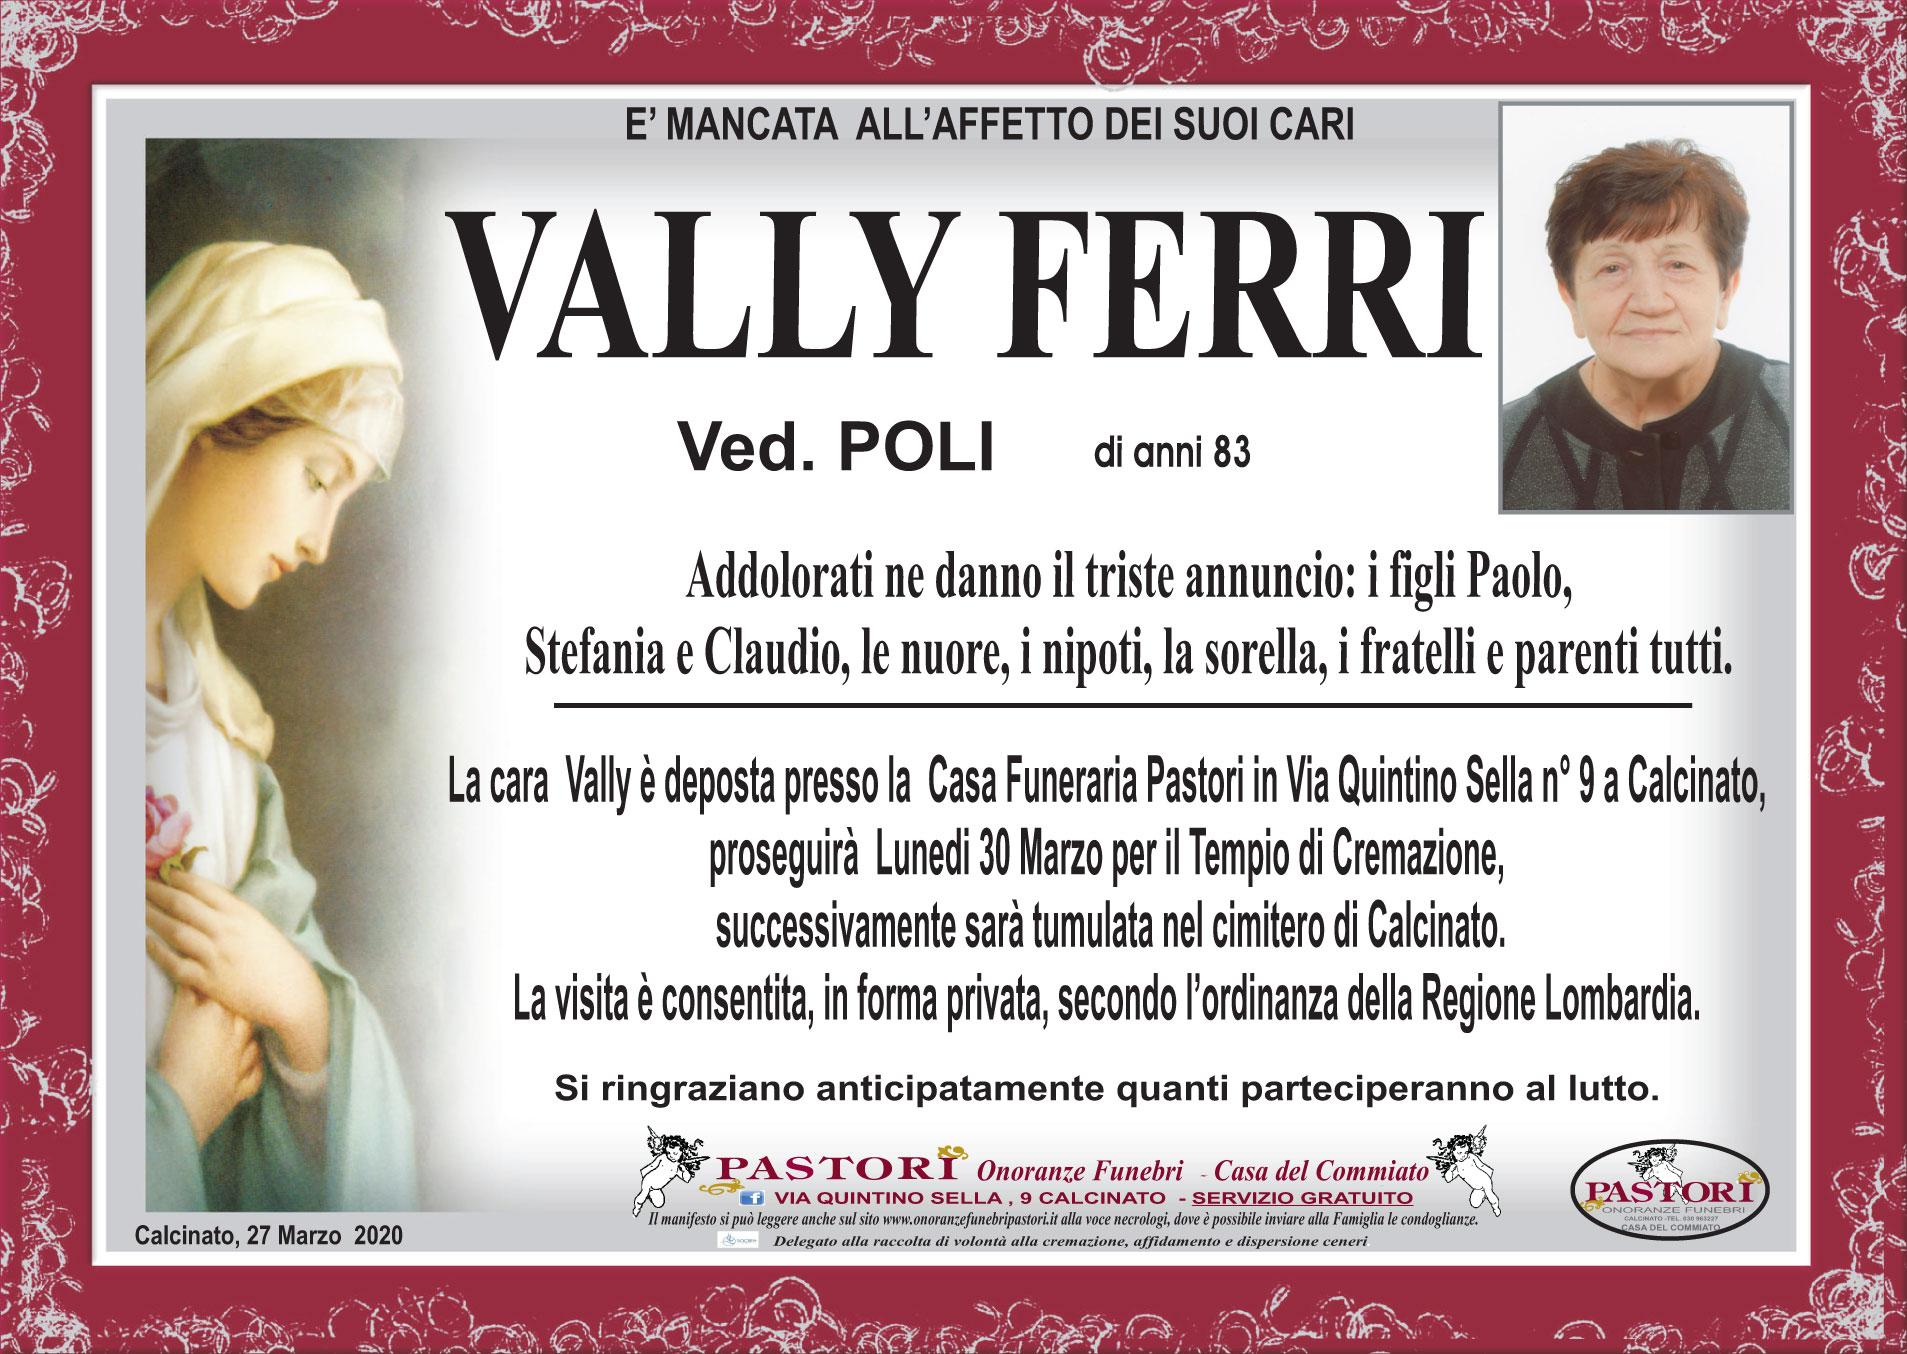 Vally Ferri